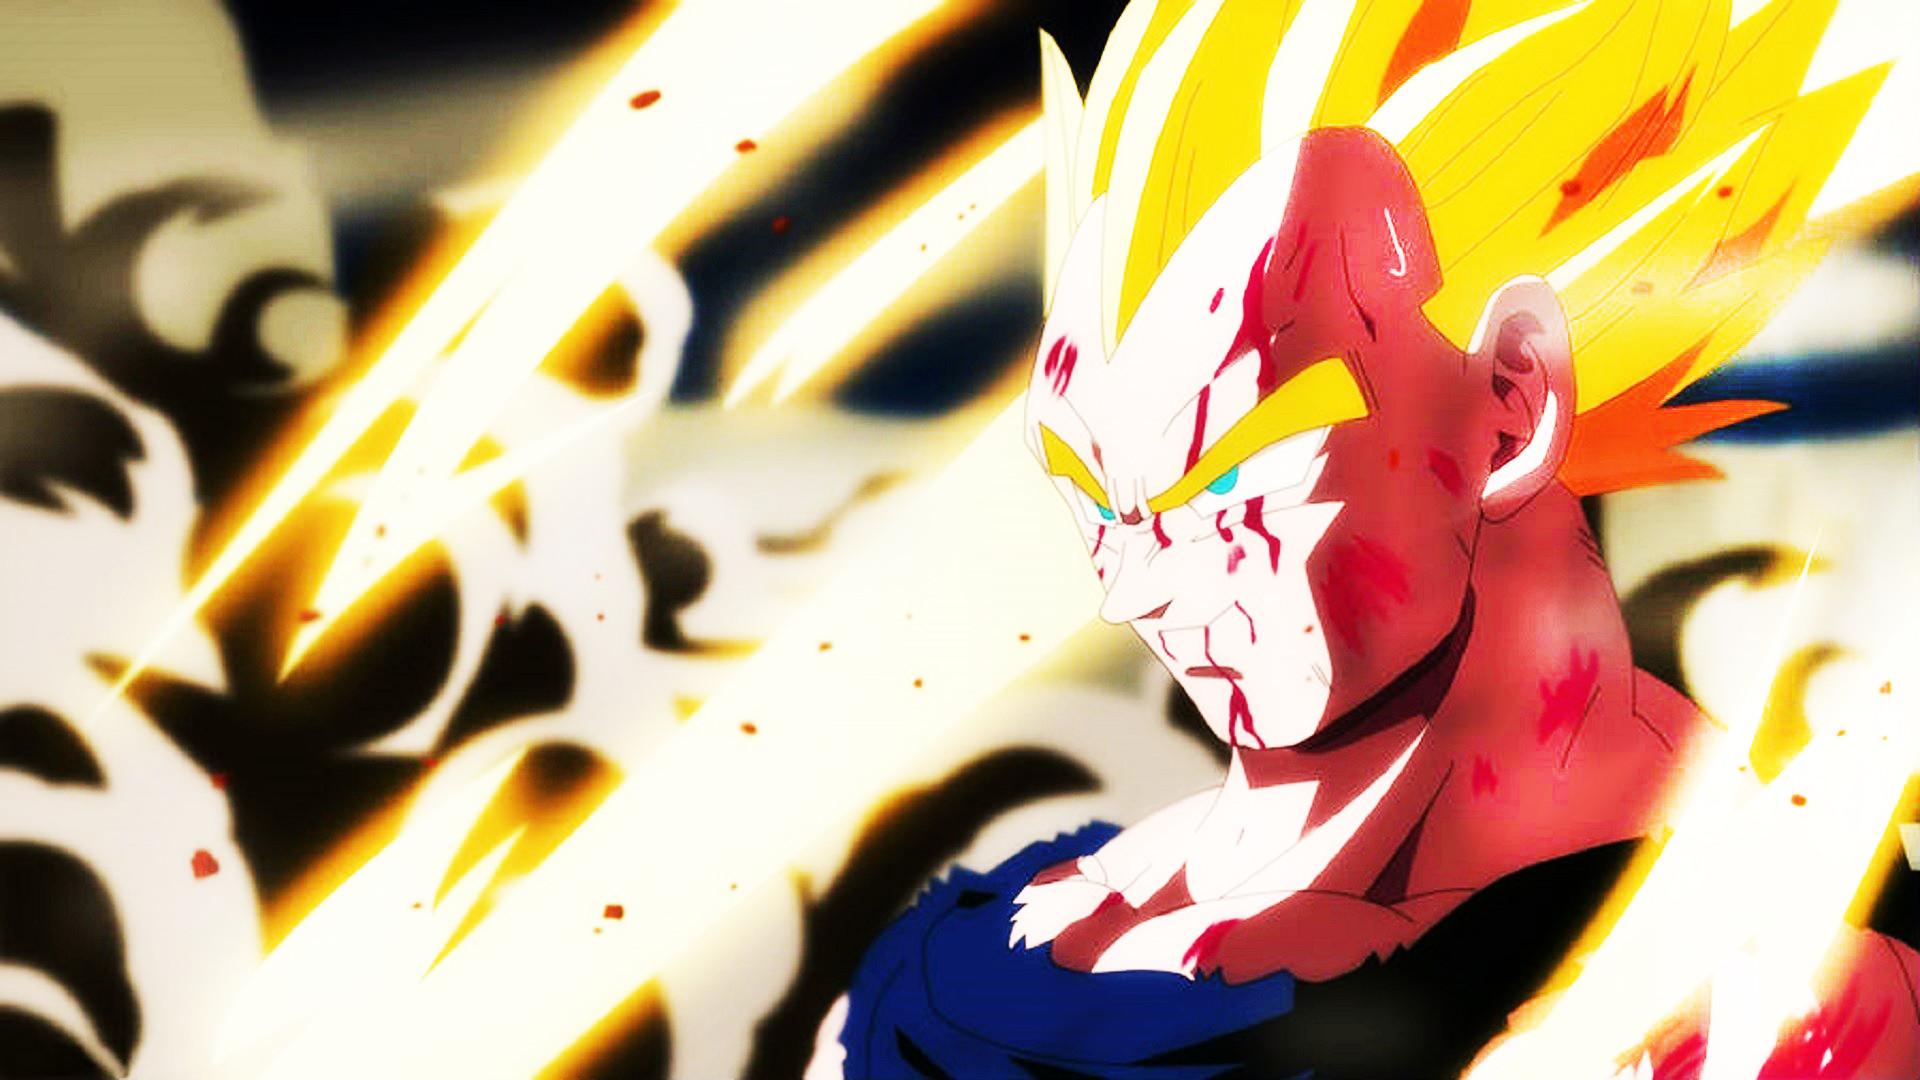 Anime Vegeta Dragon Ball Dragon Ball Z Super Saiyan 2 Son Goku  trunks Son Gohan